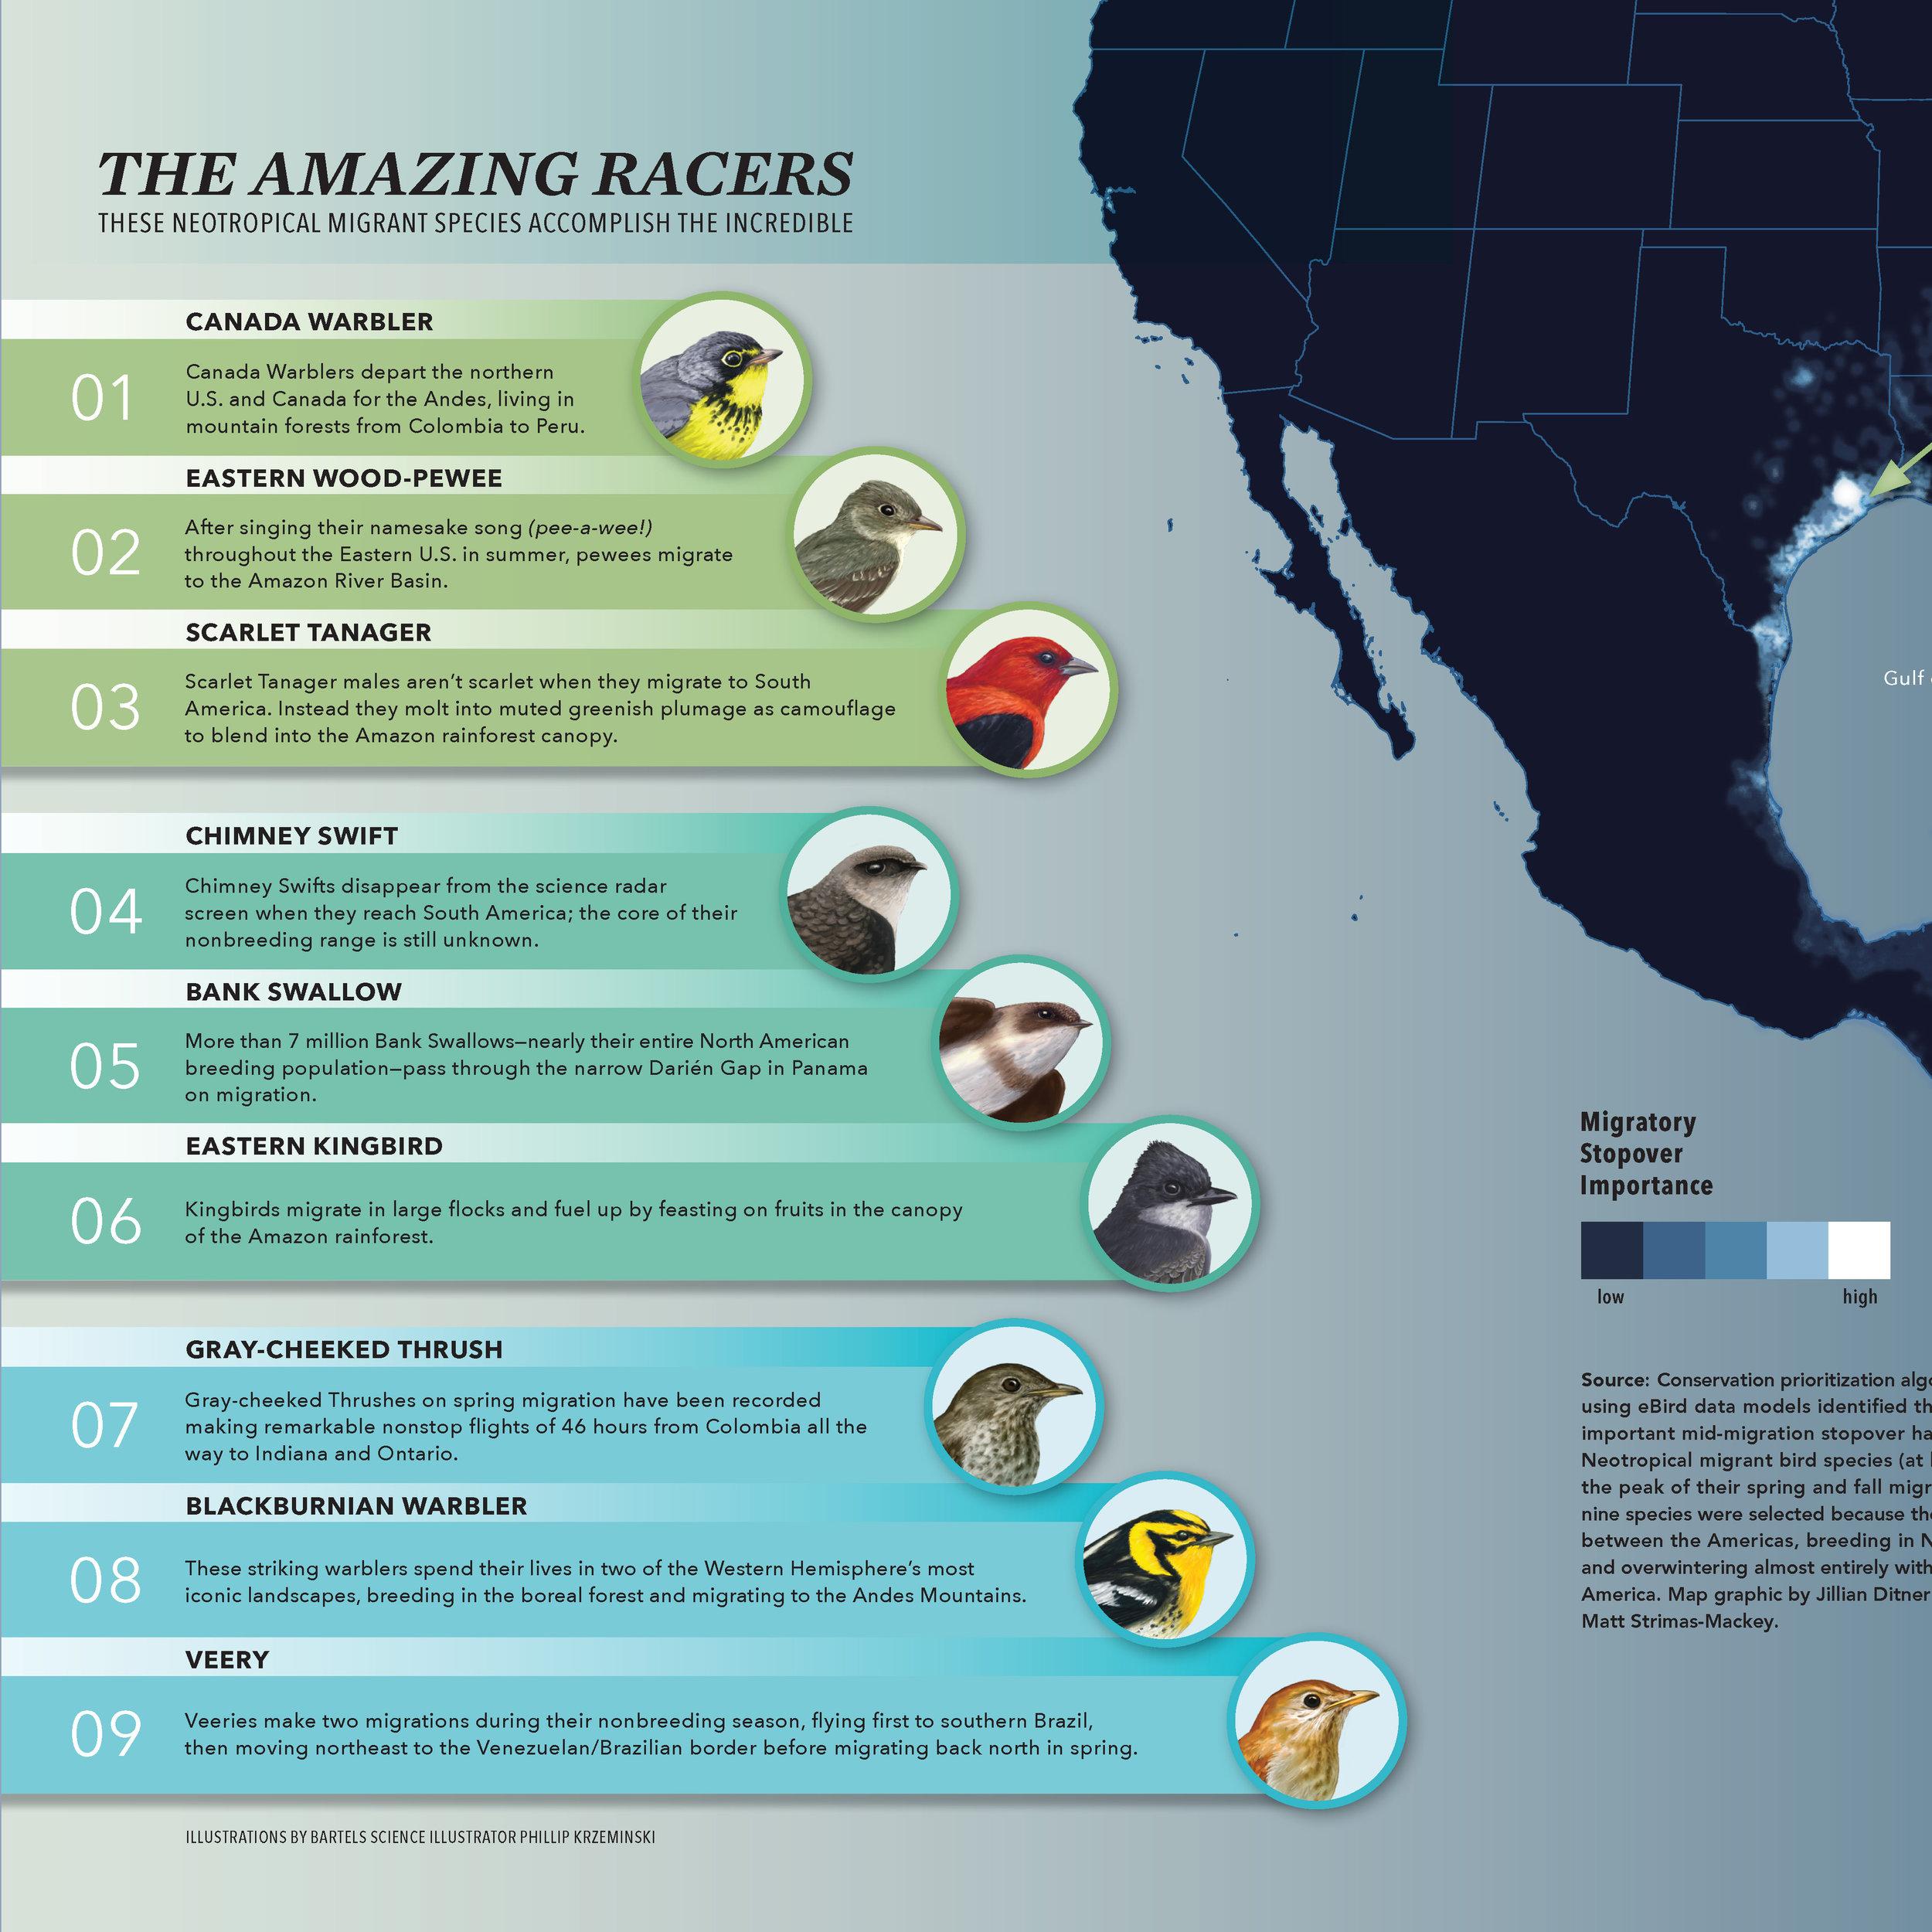 Amazing Racers